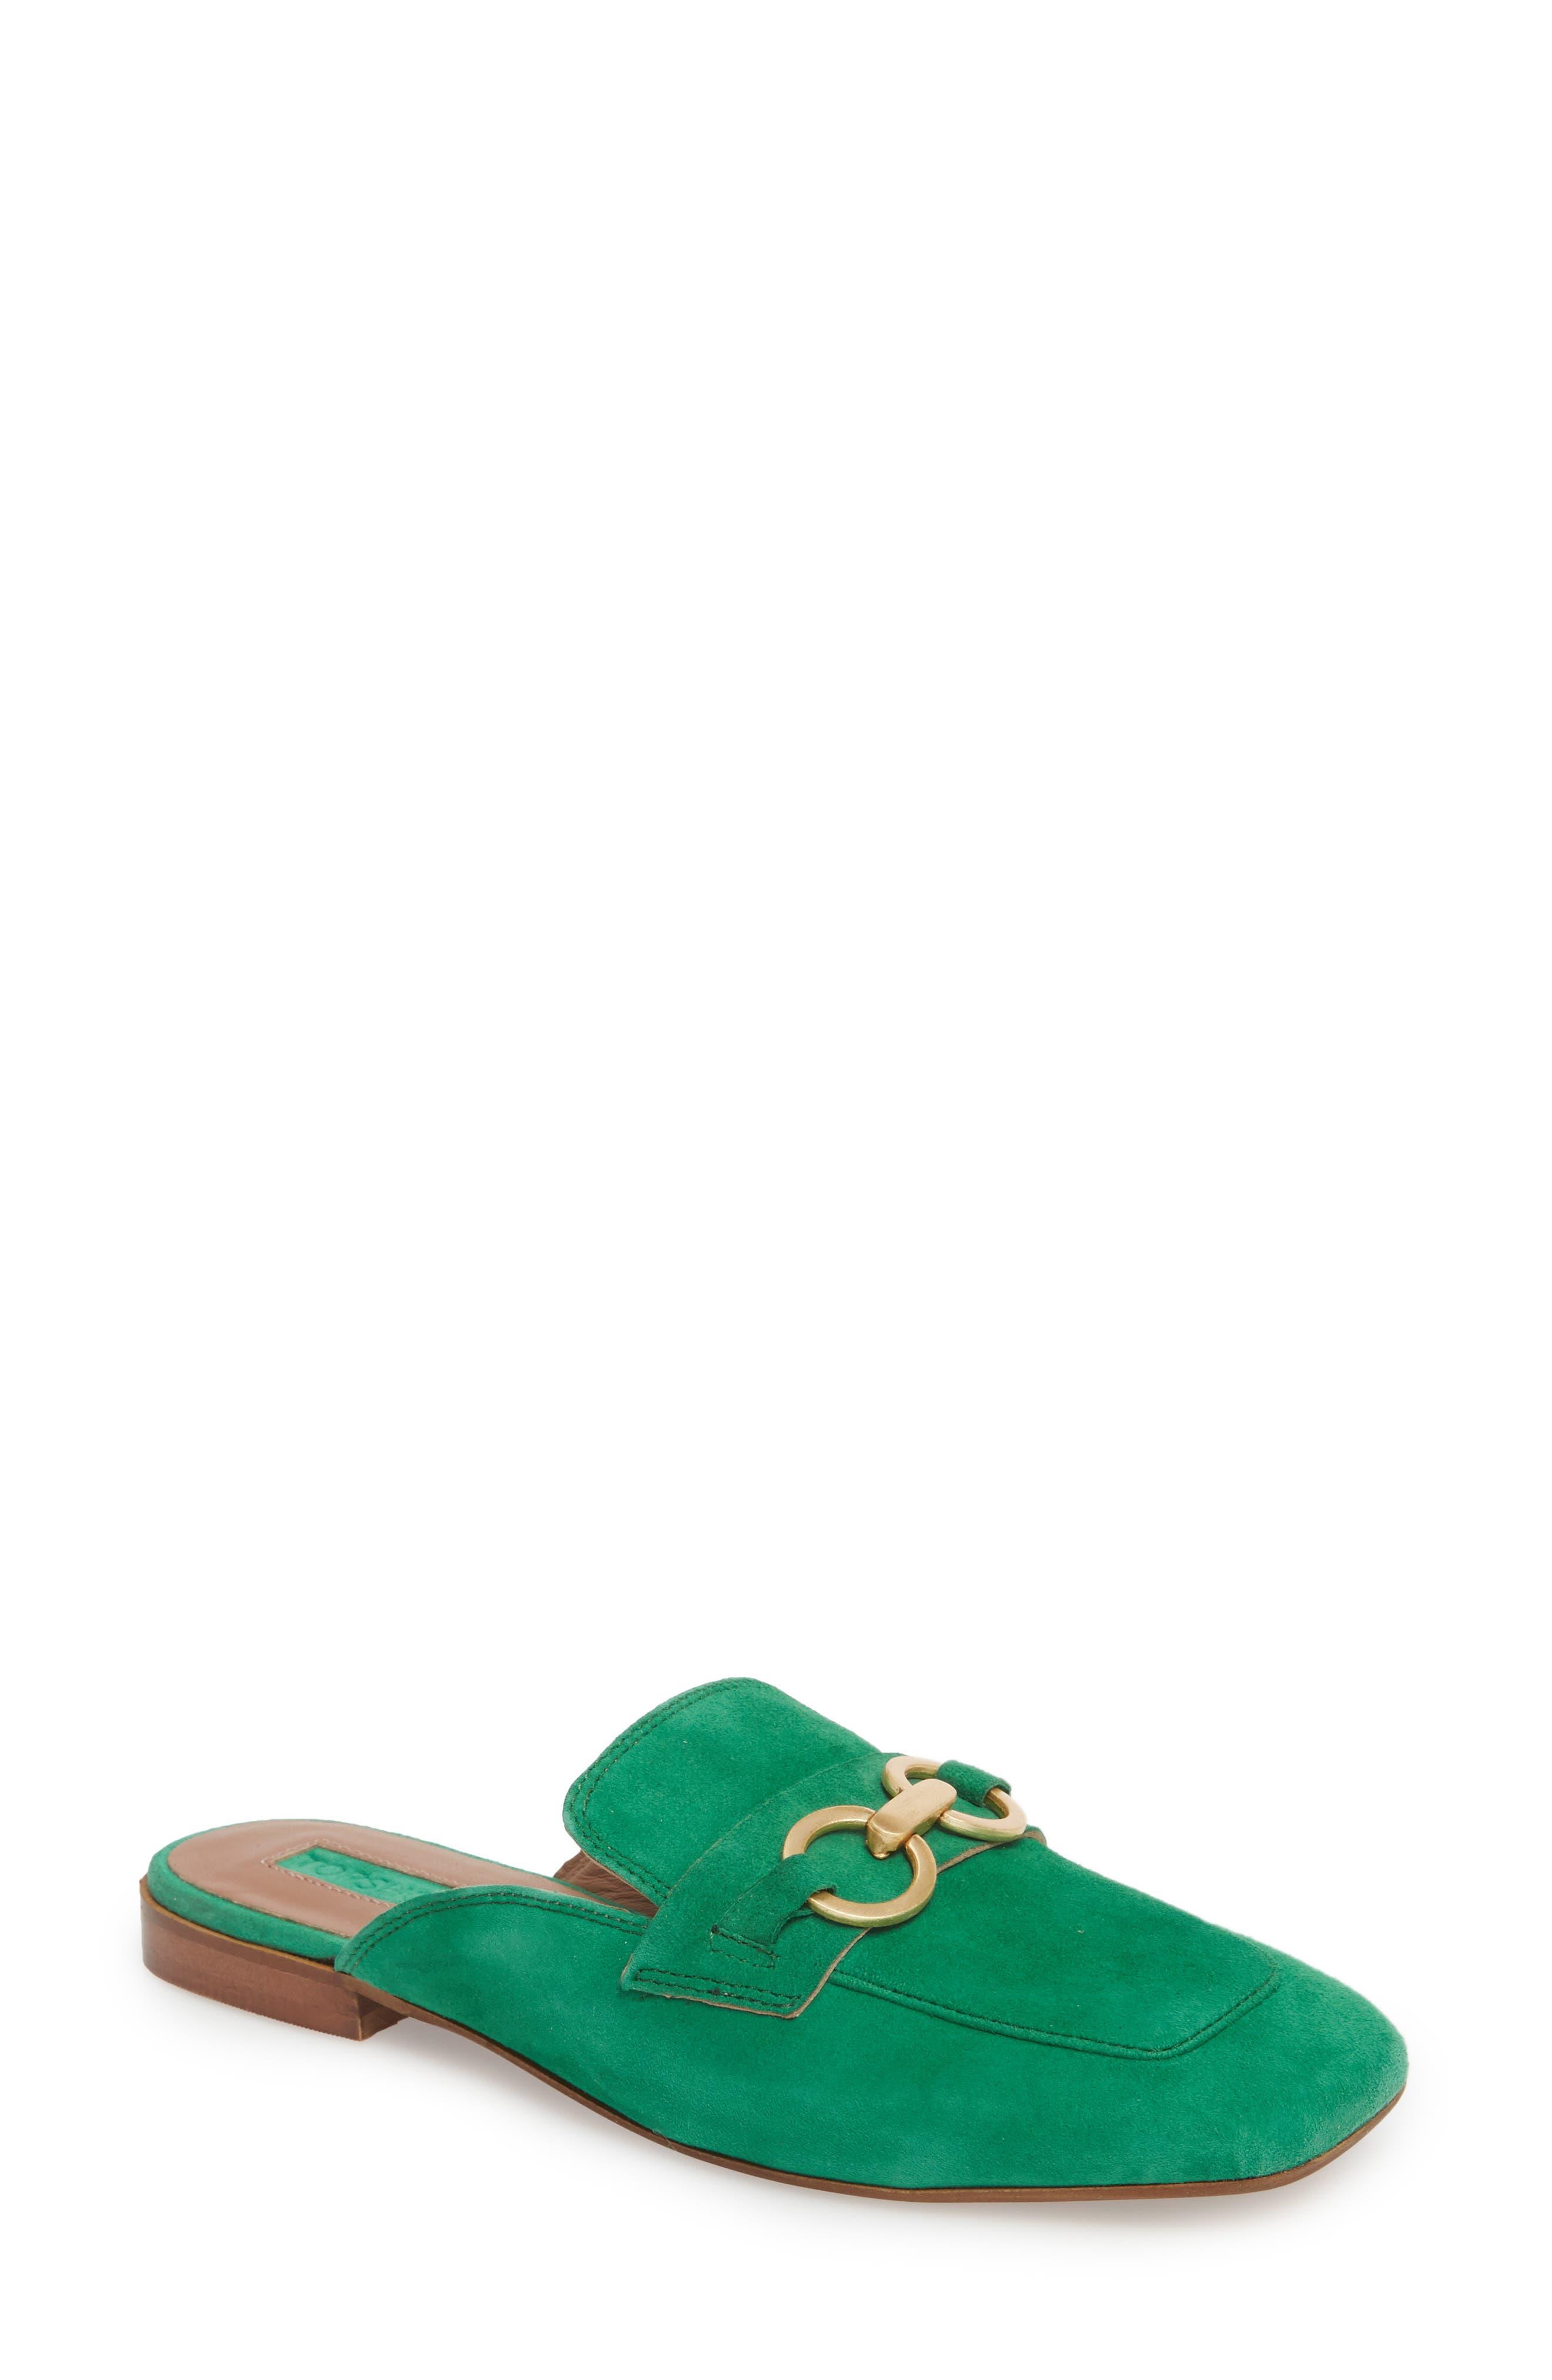 Kale Trim Loafer Mule,                         Main,                         color, Green Multi